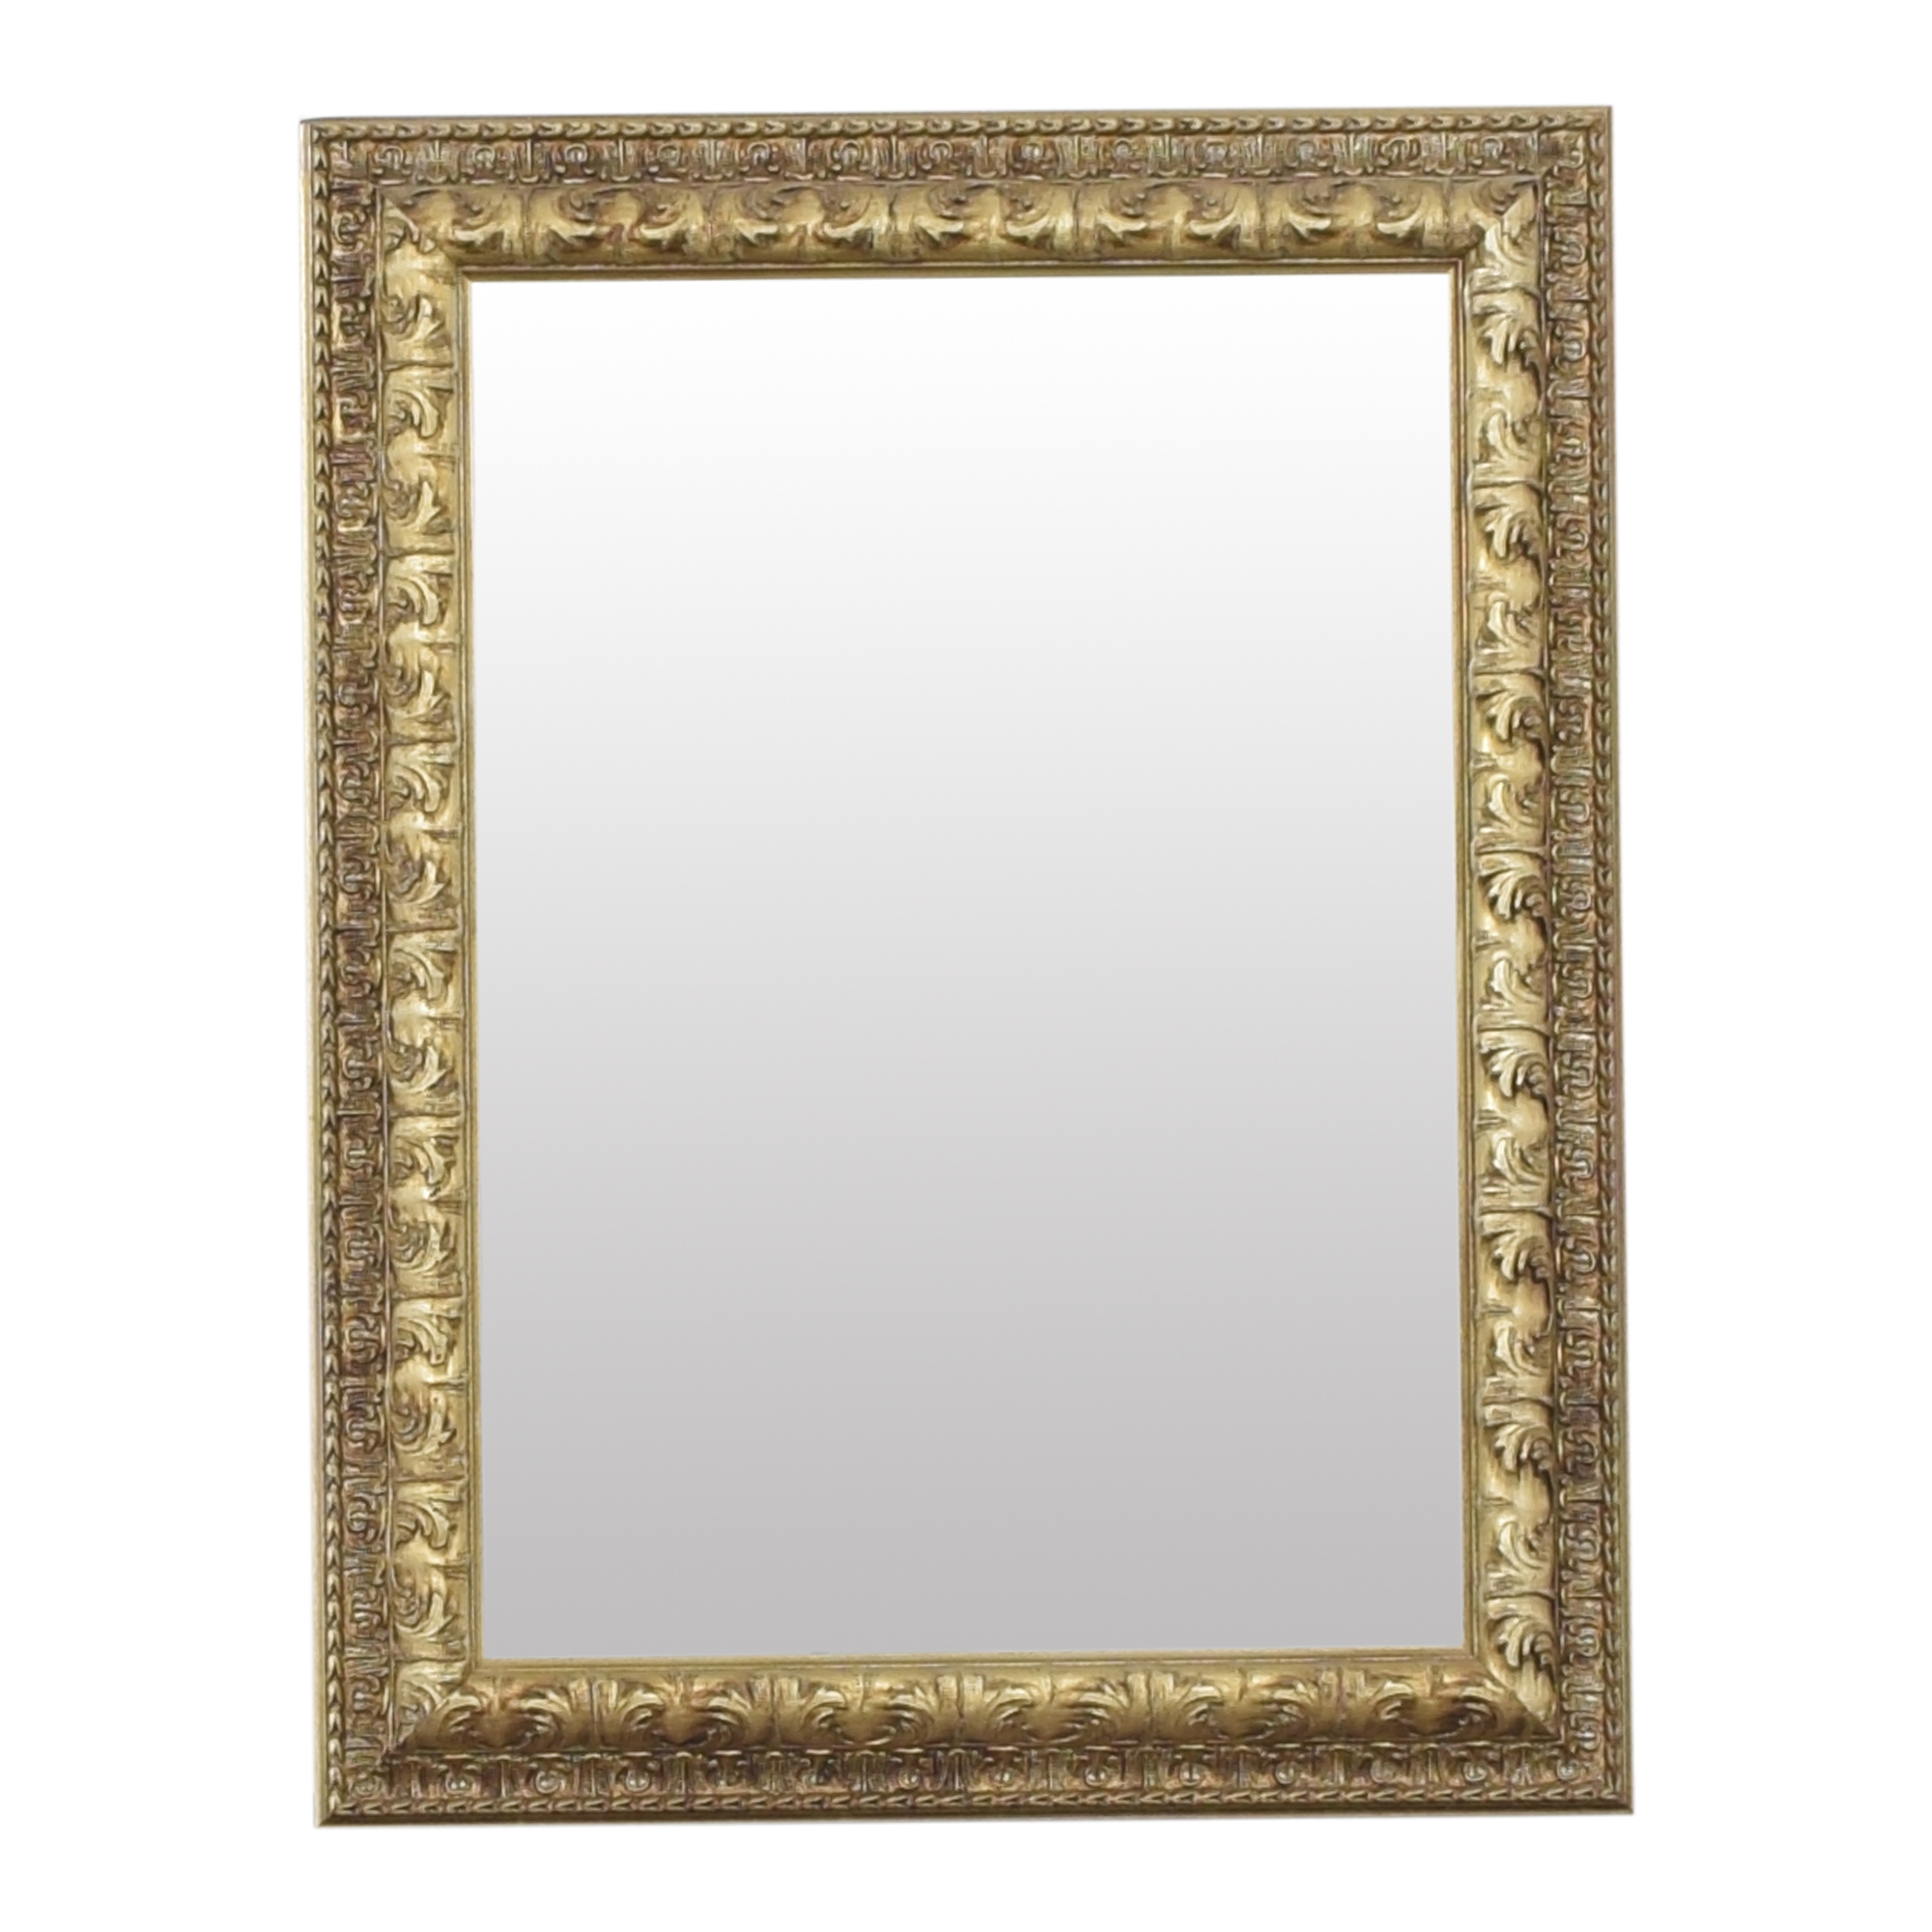 Decorative Framed Wall Mirror gold